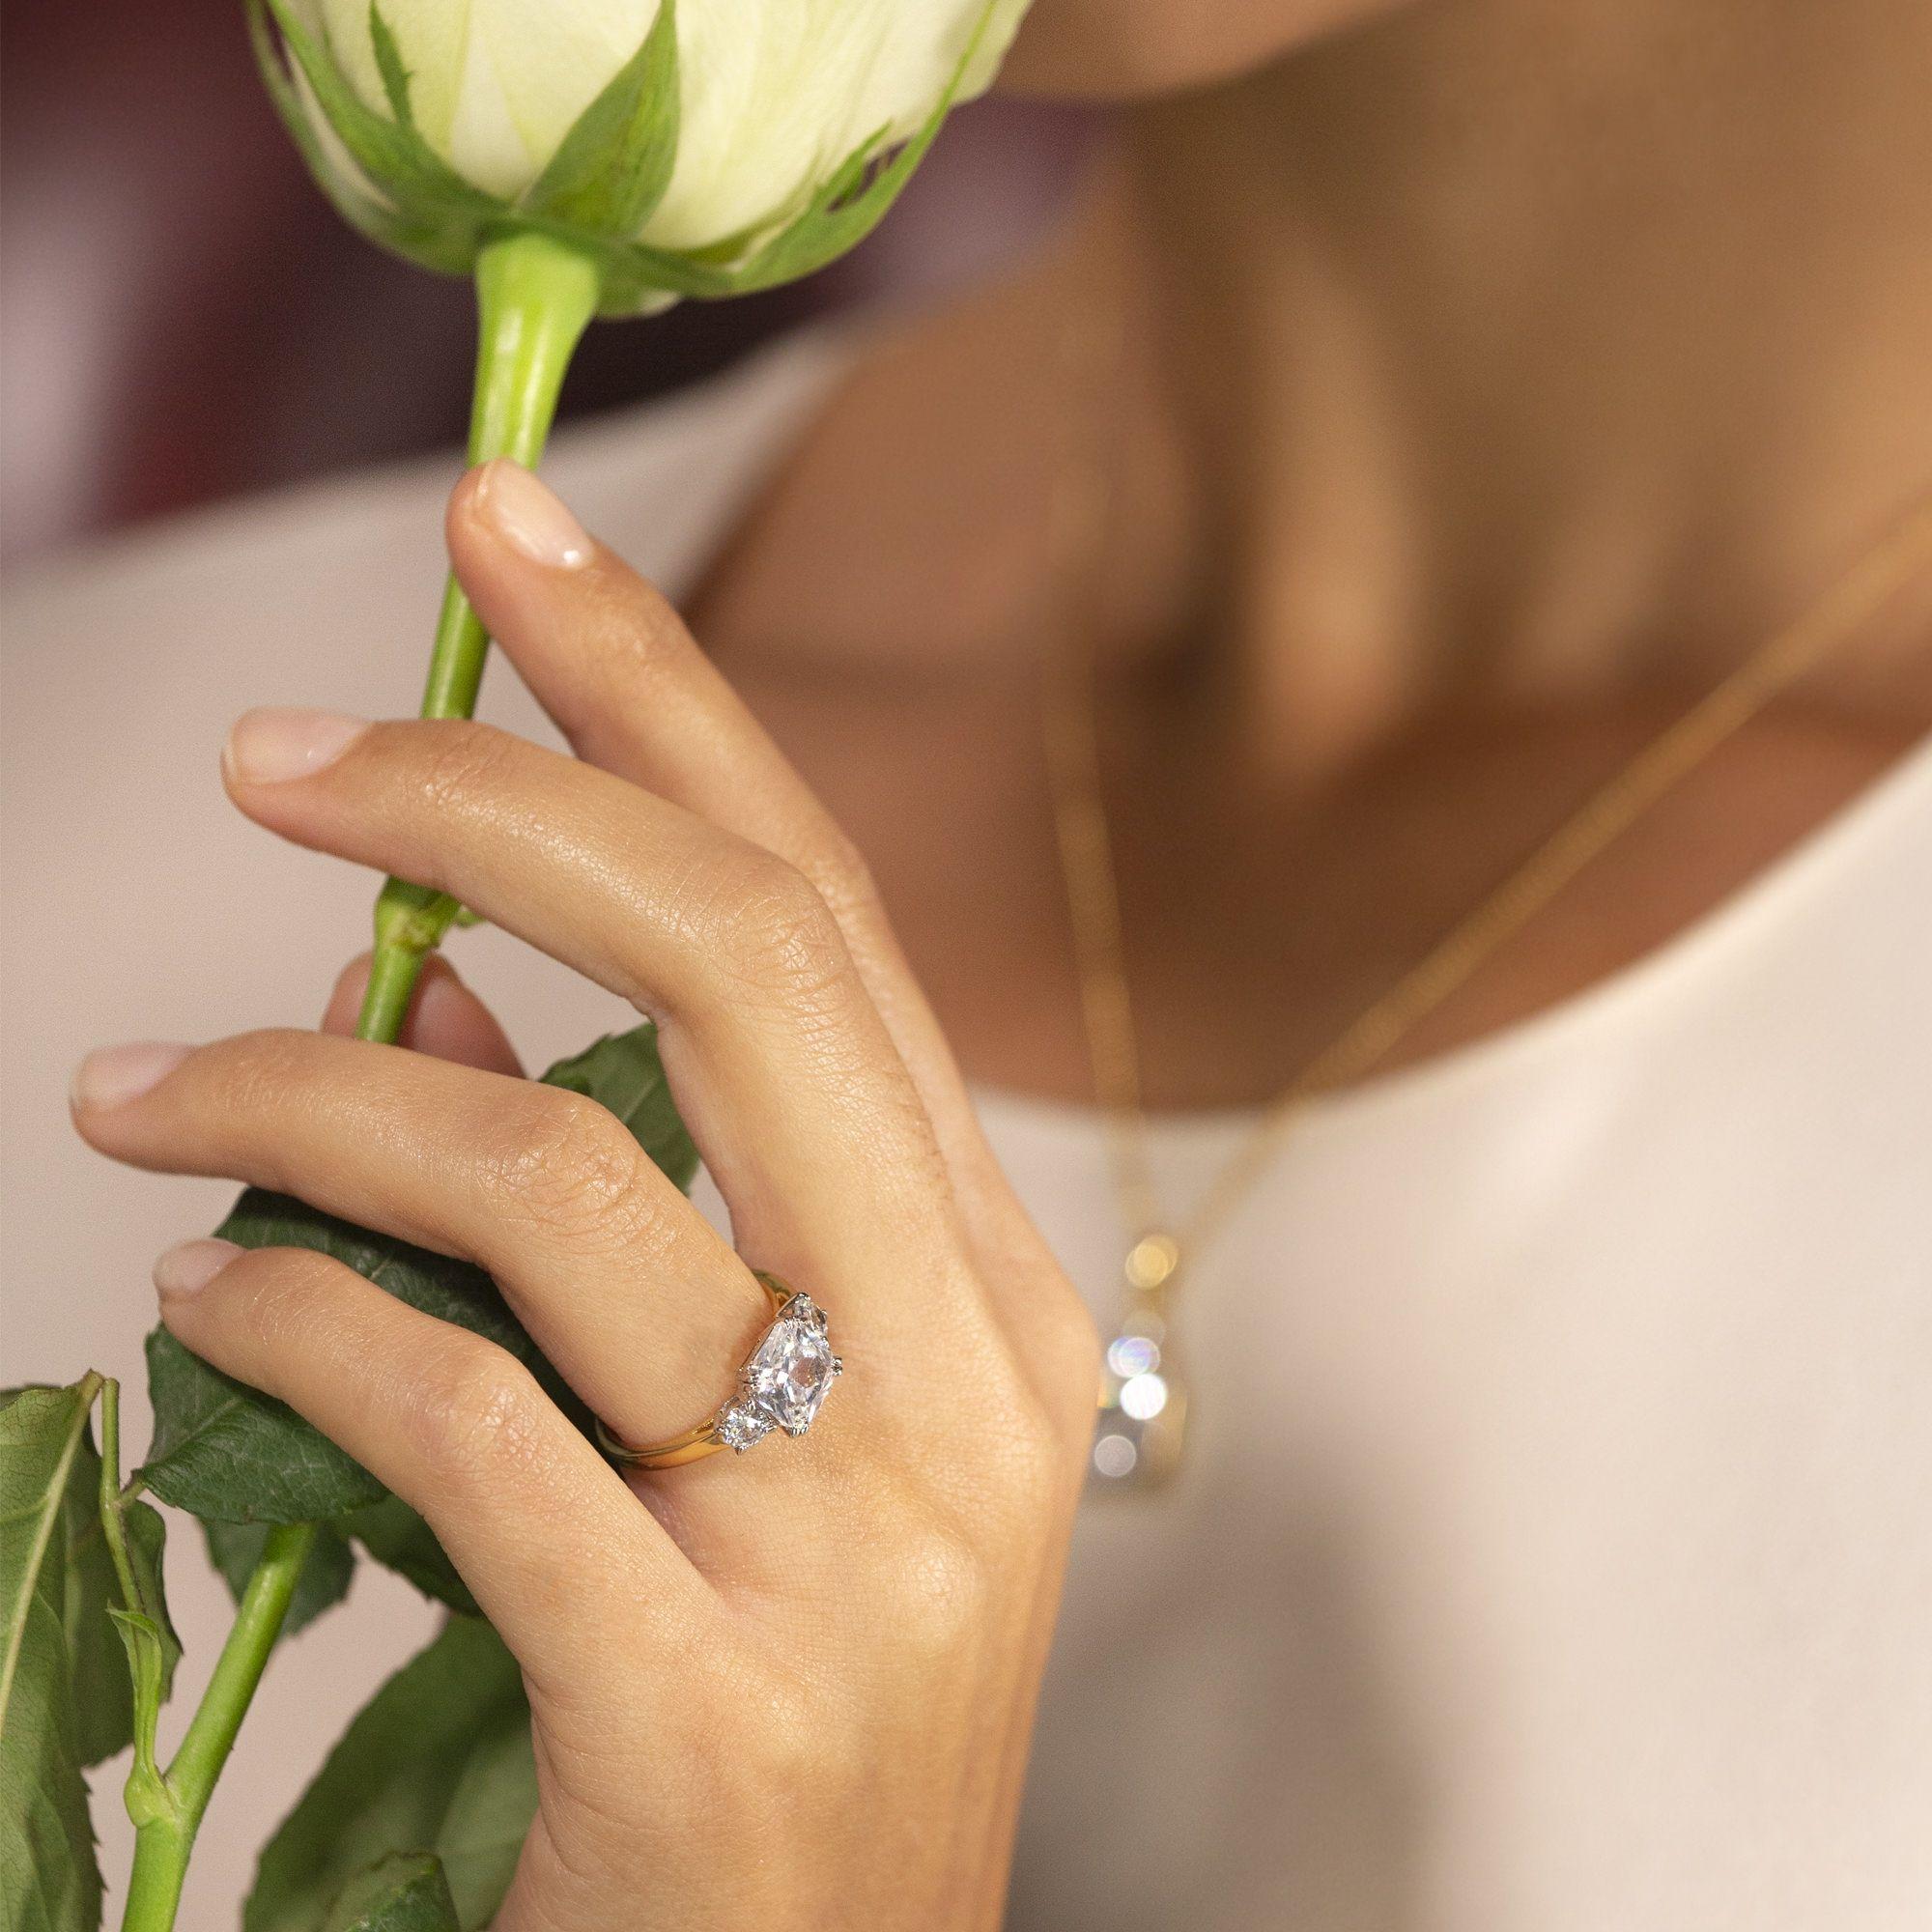 Buckley London Meghan Markle Engagement Ring Replica